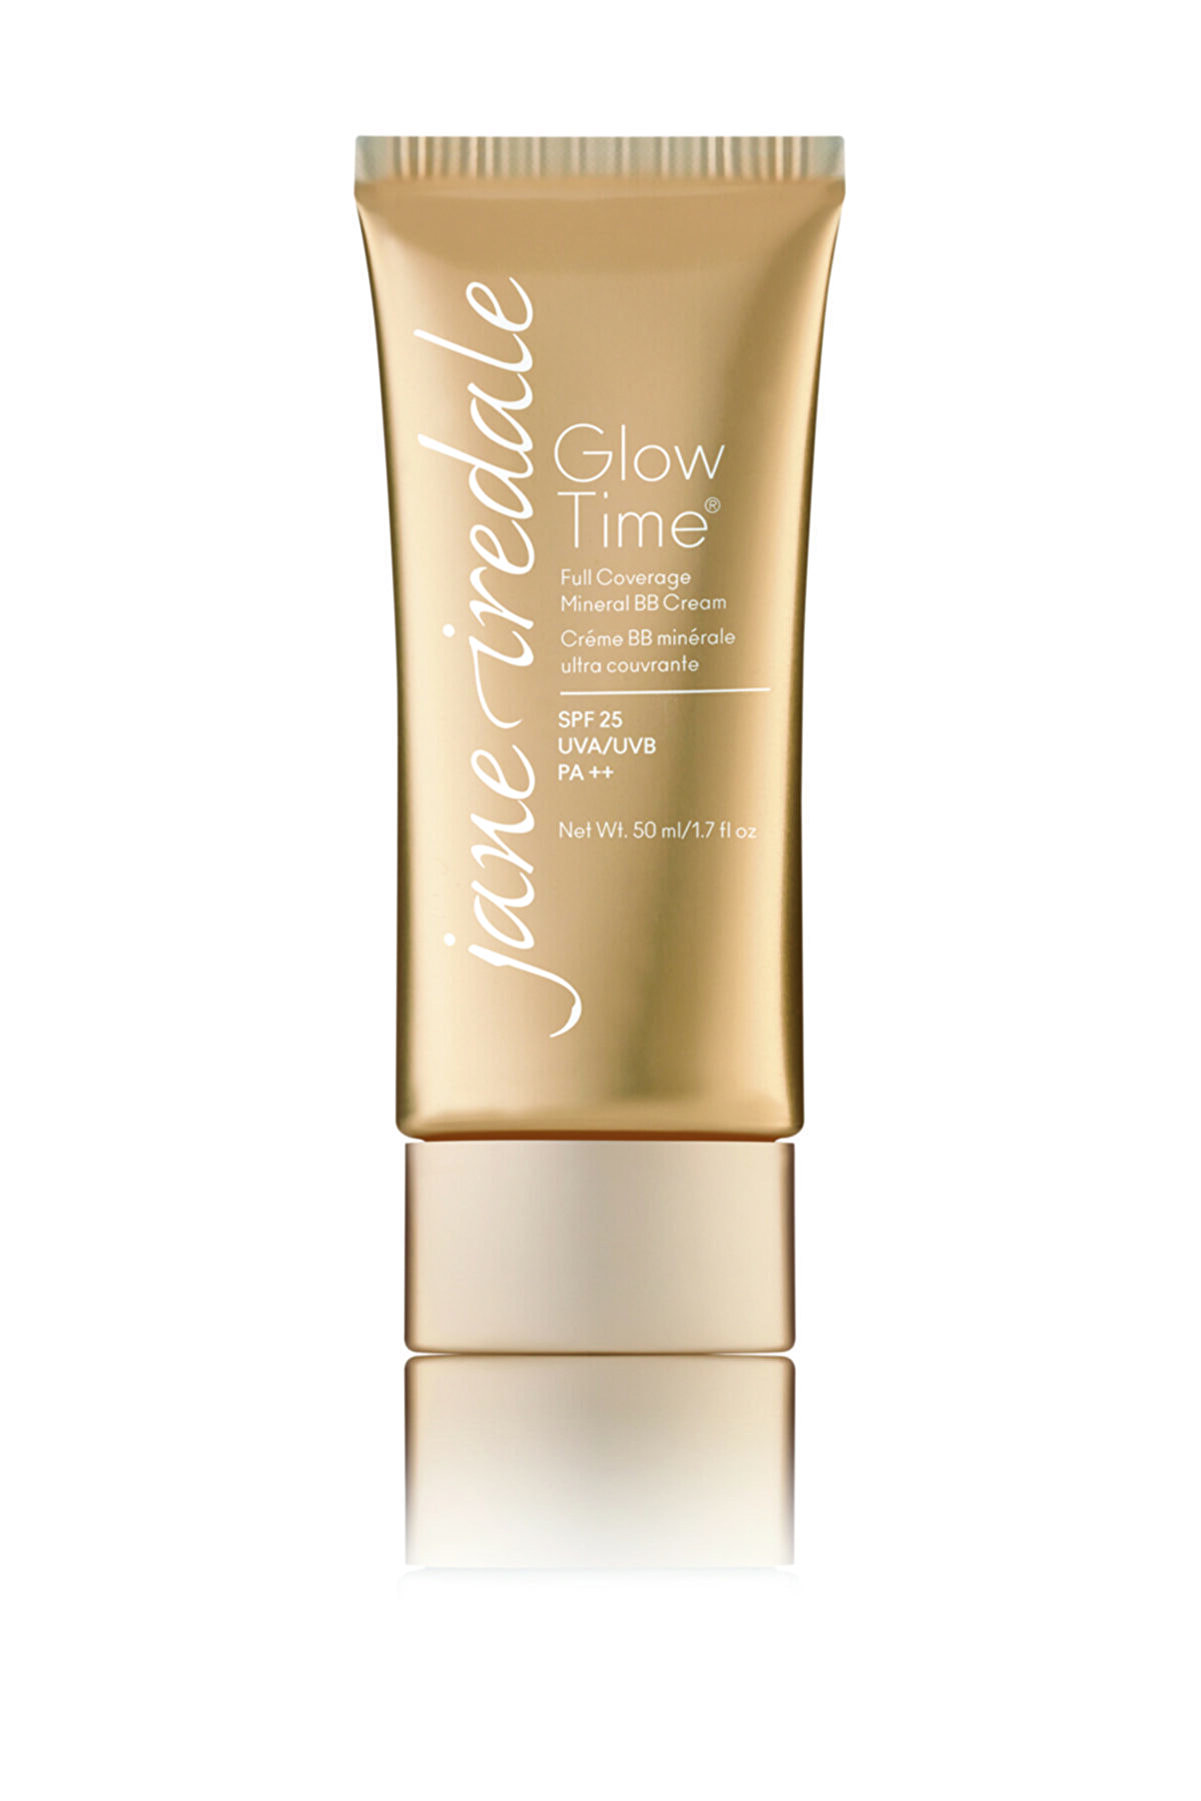 Jane Iredale Mineral BB Kapatıcı - Glow Time Full Covarage Mineral BB Cream Spf 25 BB3 50 ml 670959120366